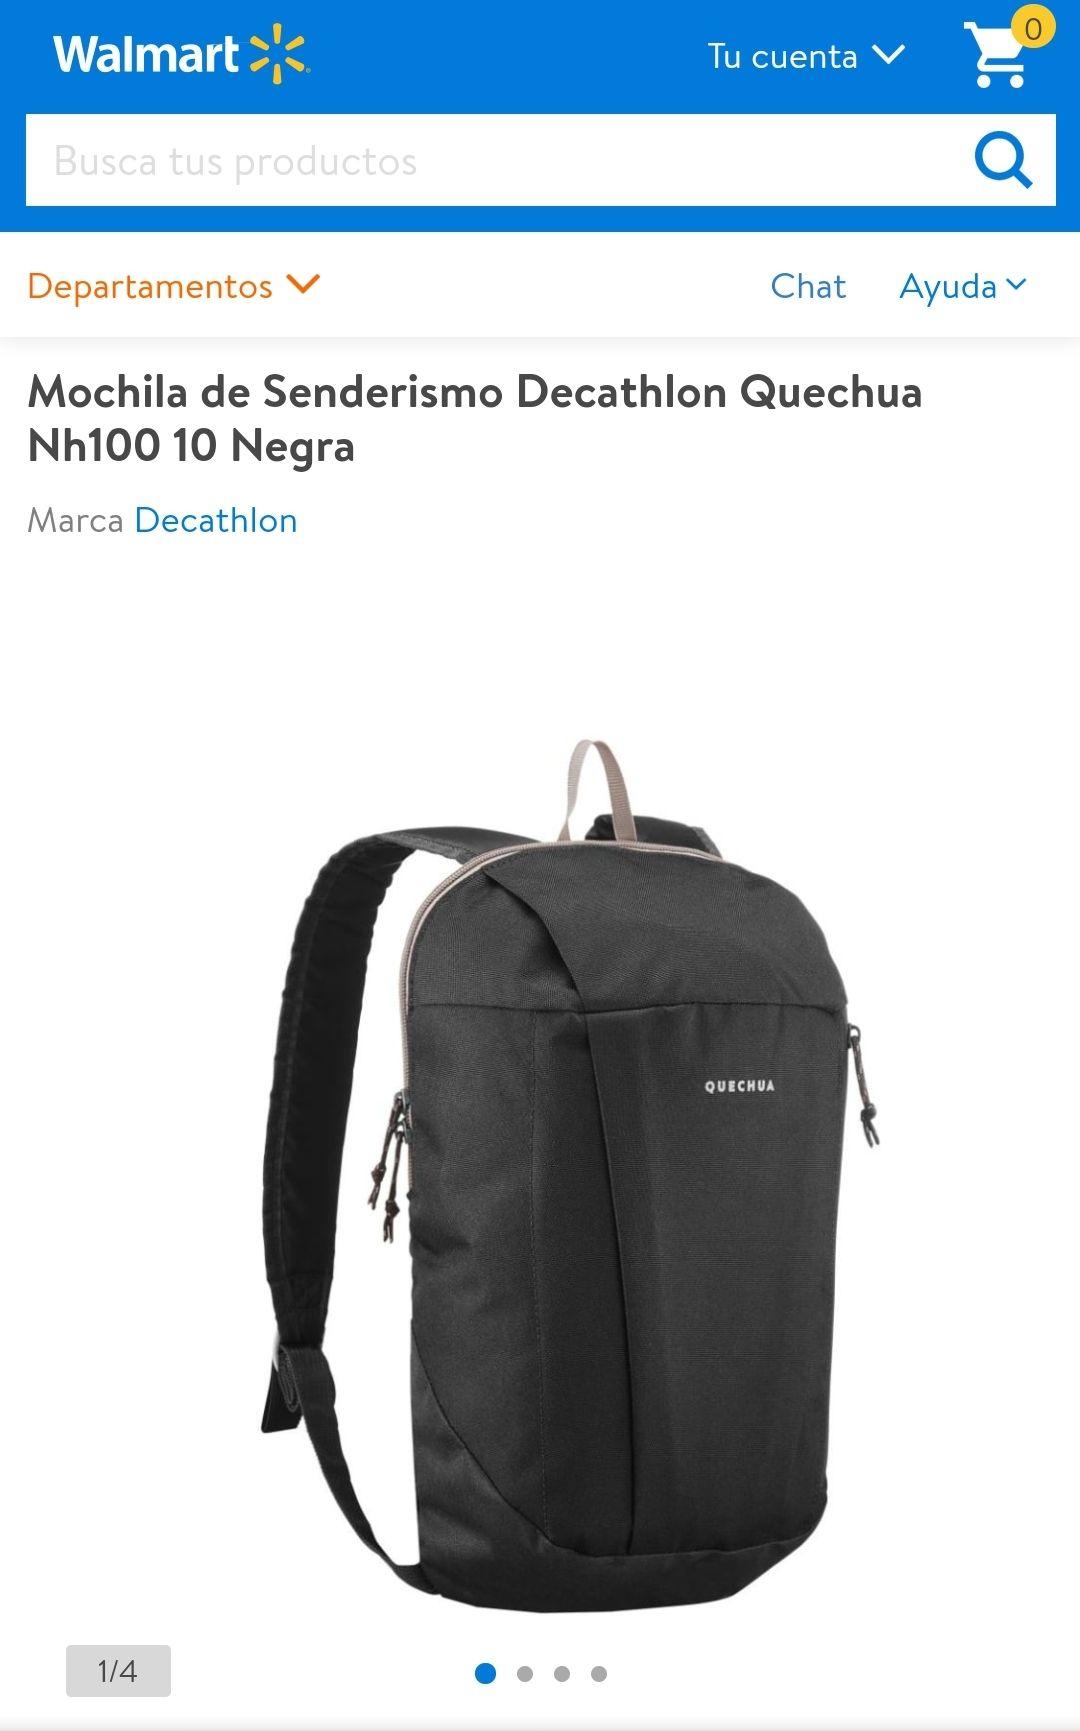 Walmart: Mochila de Senderismo Decathlon Quechua Nh100 10